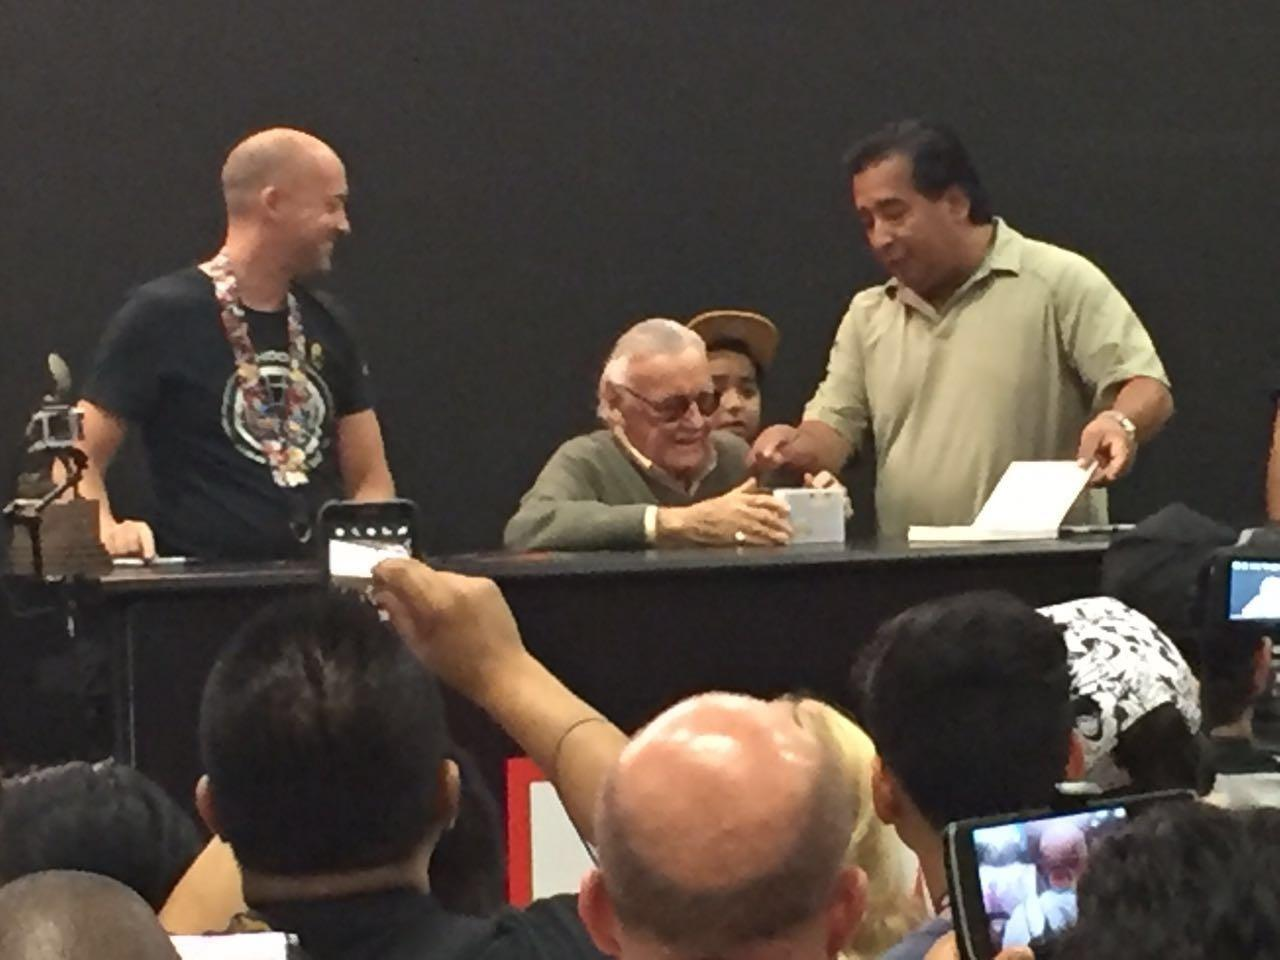 24.jul.2016 - Stan Lee passeia pelo estande da Marvel e dá autógrafos na San Diego Comic-Con 2016